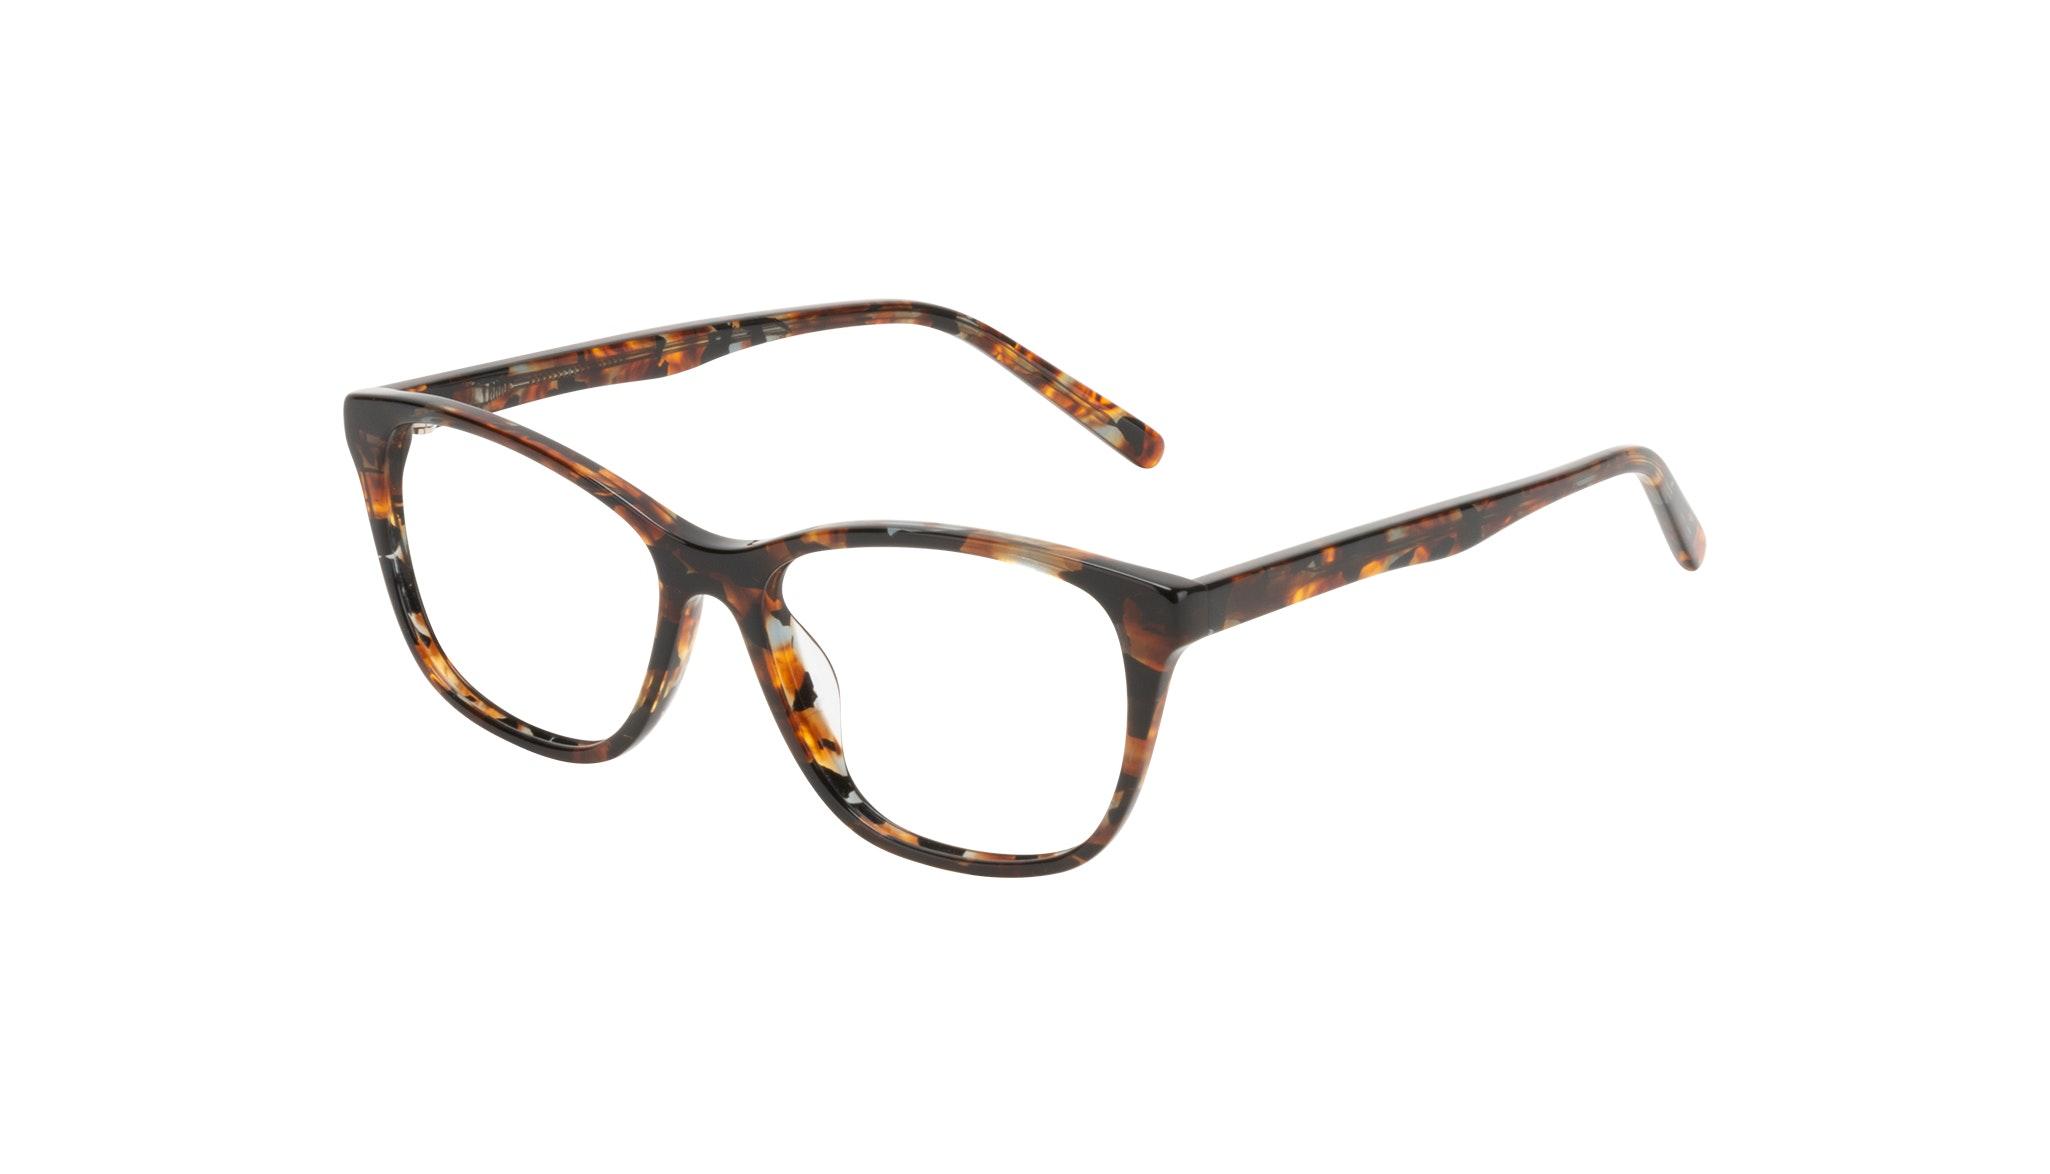 Affordable Fashion Glasses Cat Eye Eyeglasses Women Myrtle Petite Mahogany Tilt